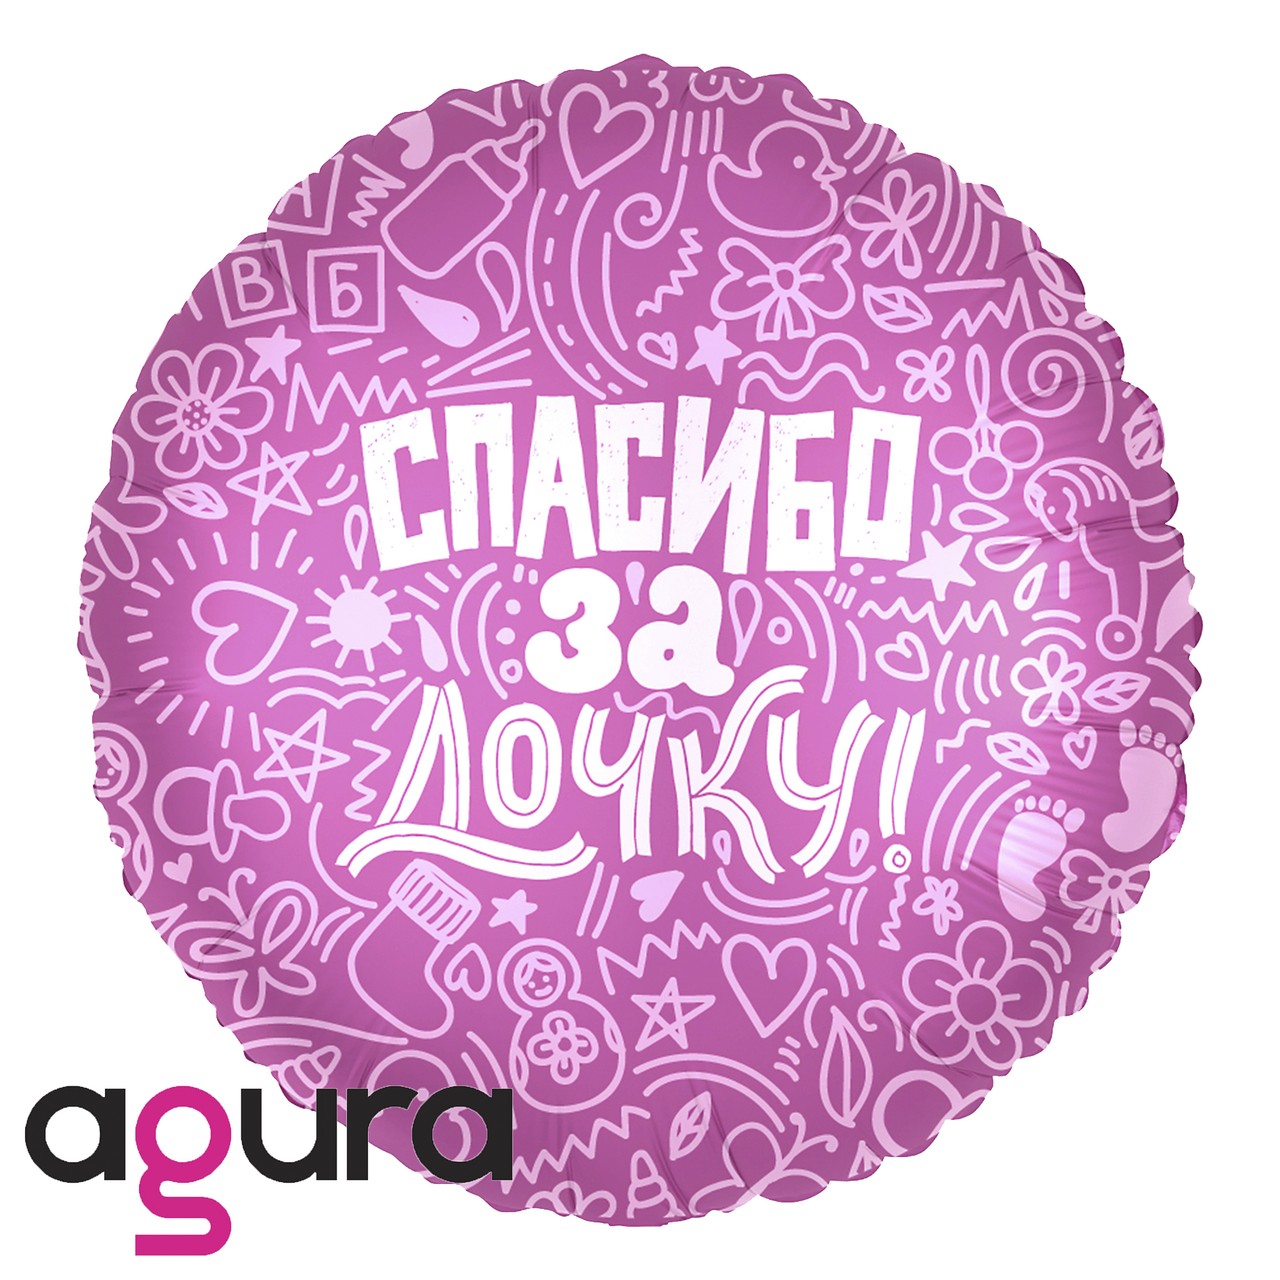 Фольгований кулька Agura (Агура) Дякую за дочку, 18' (45 см)